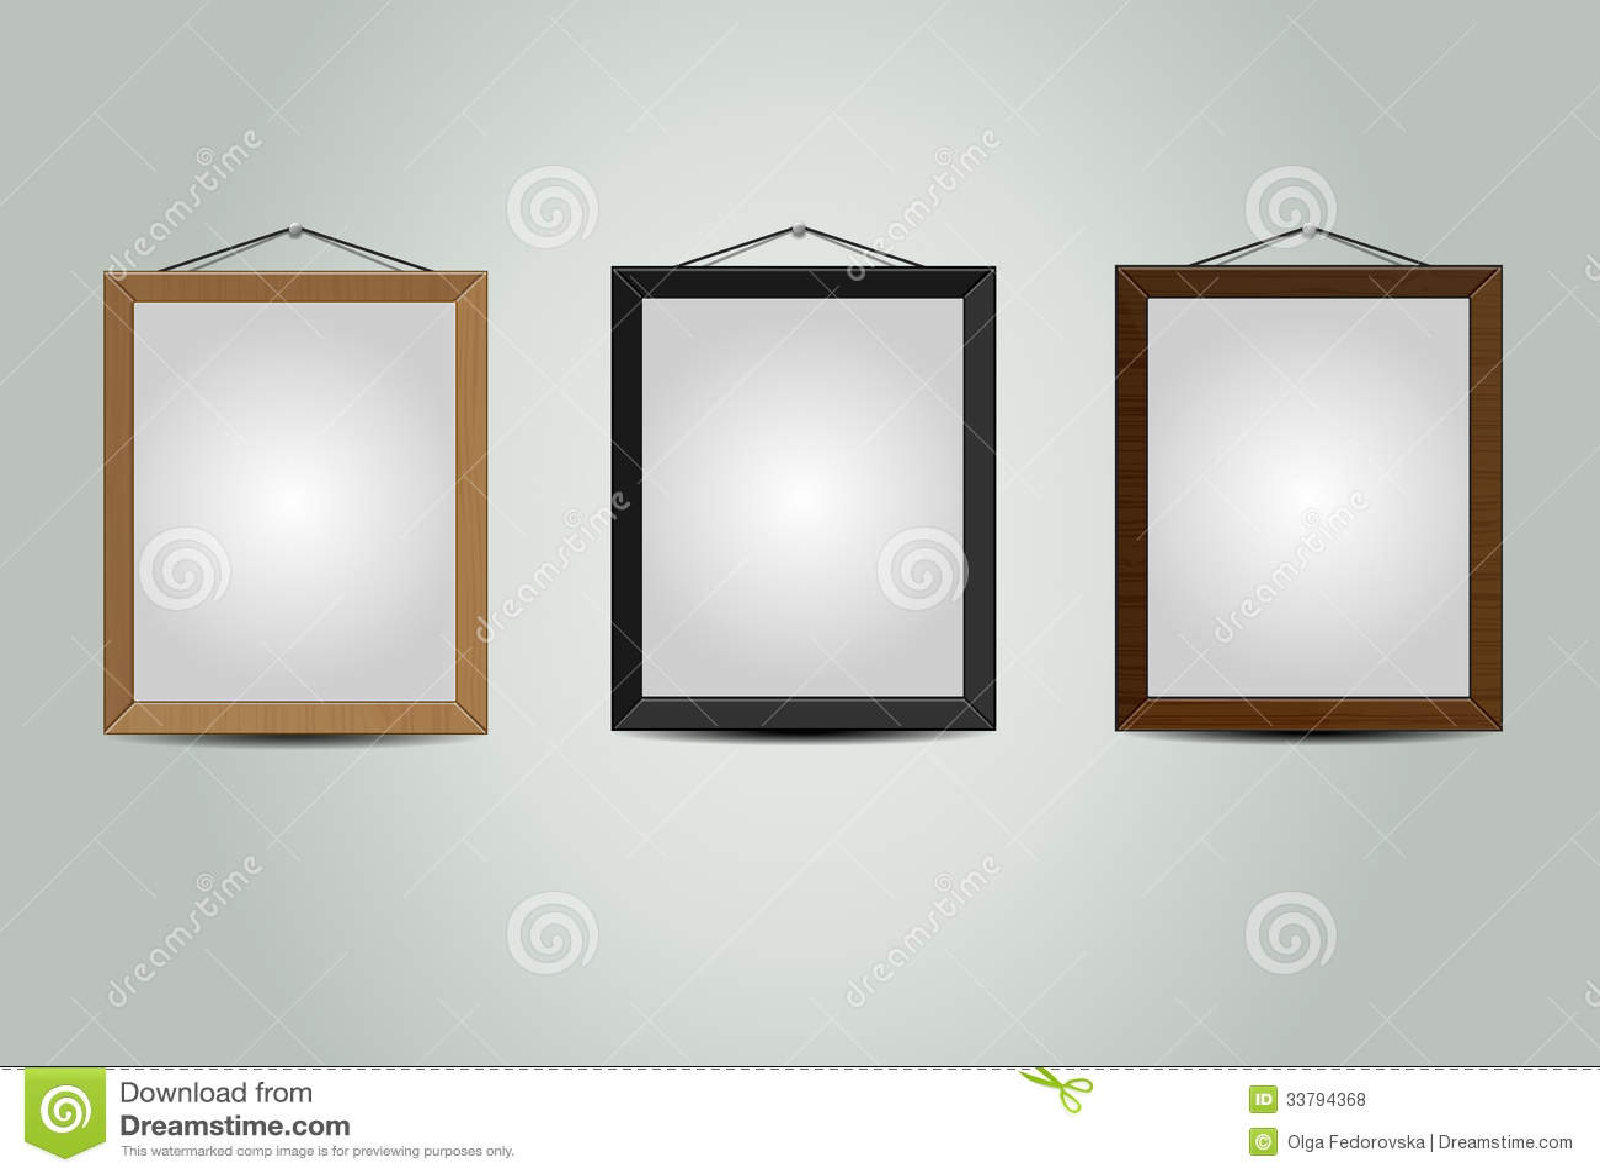 wooden hanging frames royalty free stock photos image. Black Bedroom Furniture Sets. Home Design Ideas